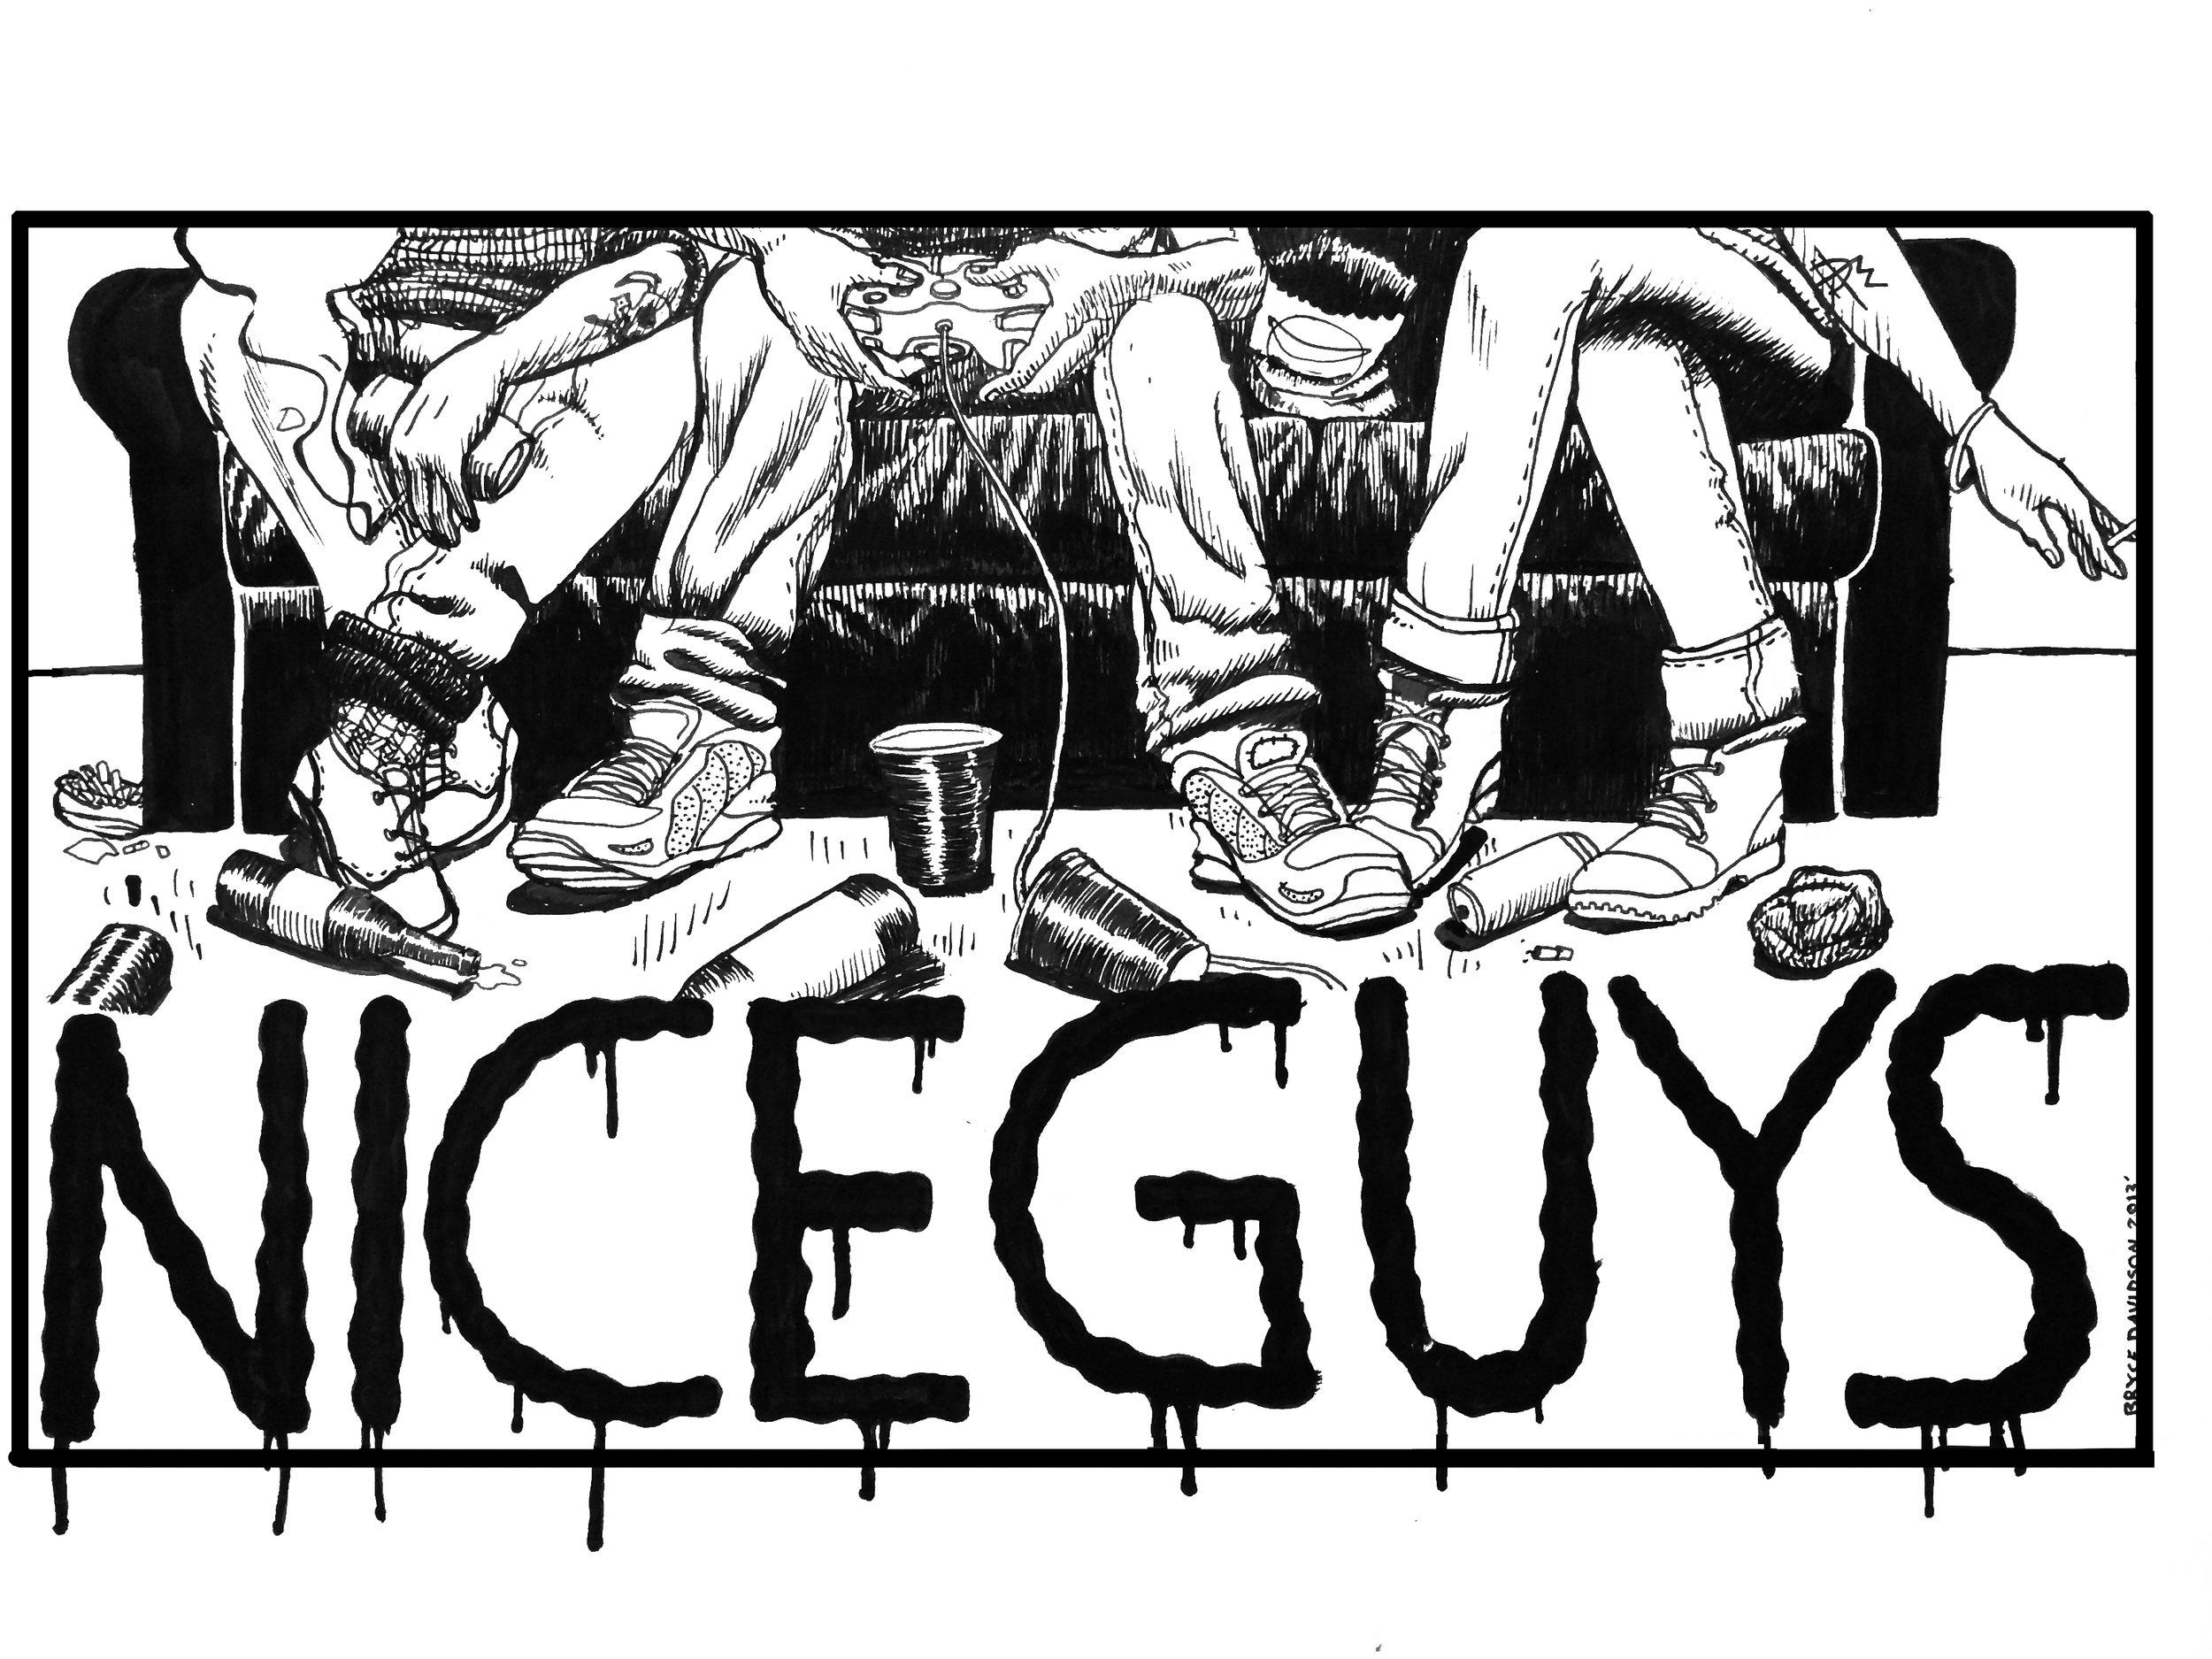 - T-shirt DesignClient: Nice Guys (band)T-shirt design for the band Nice Guys2012